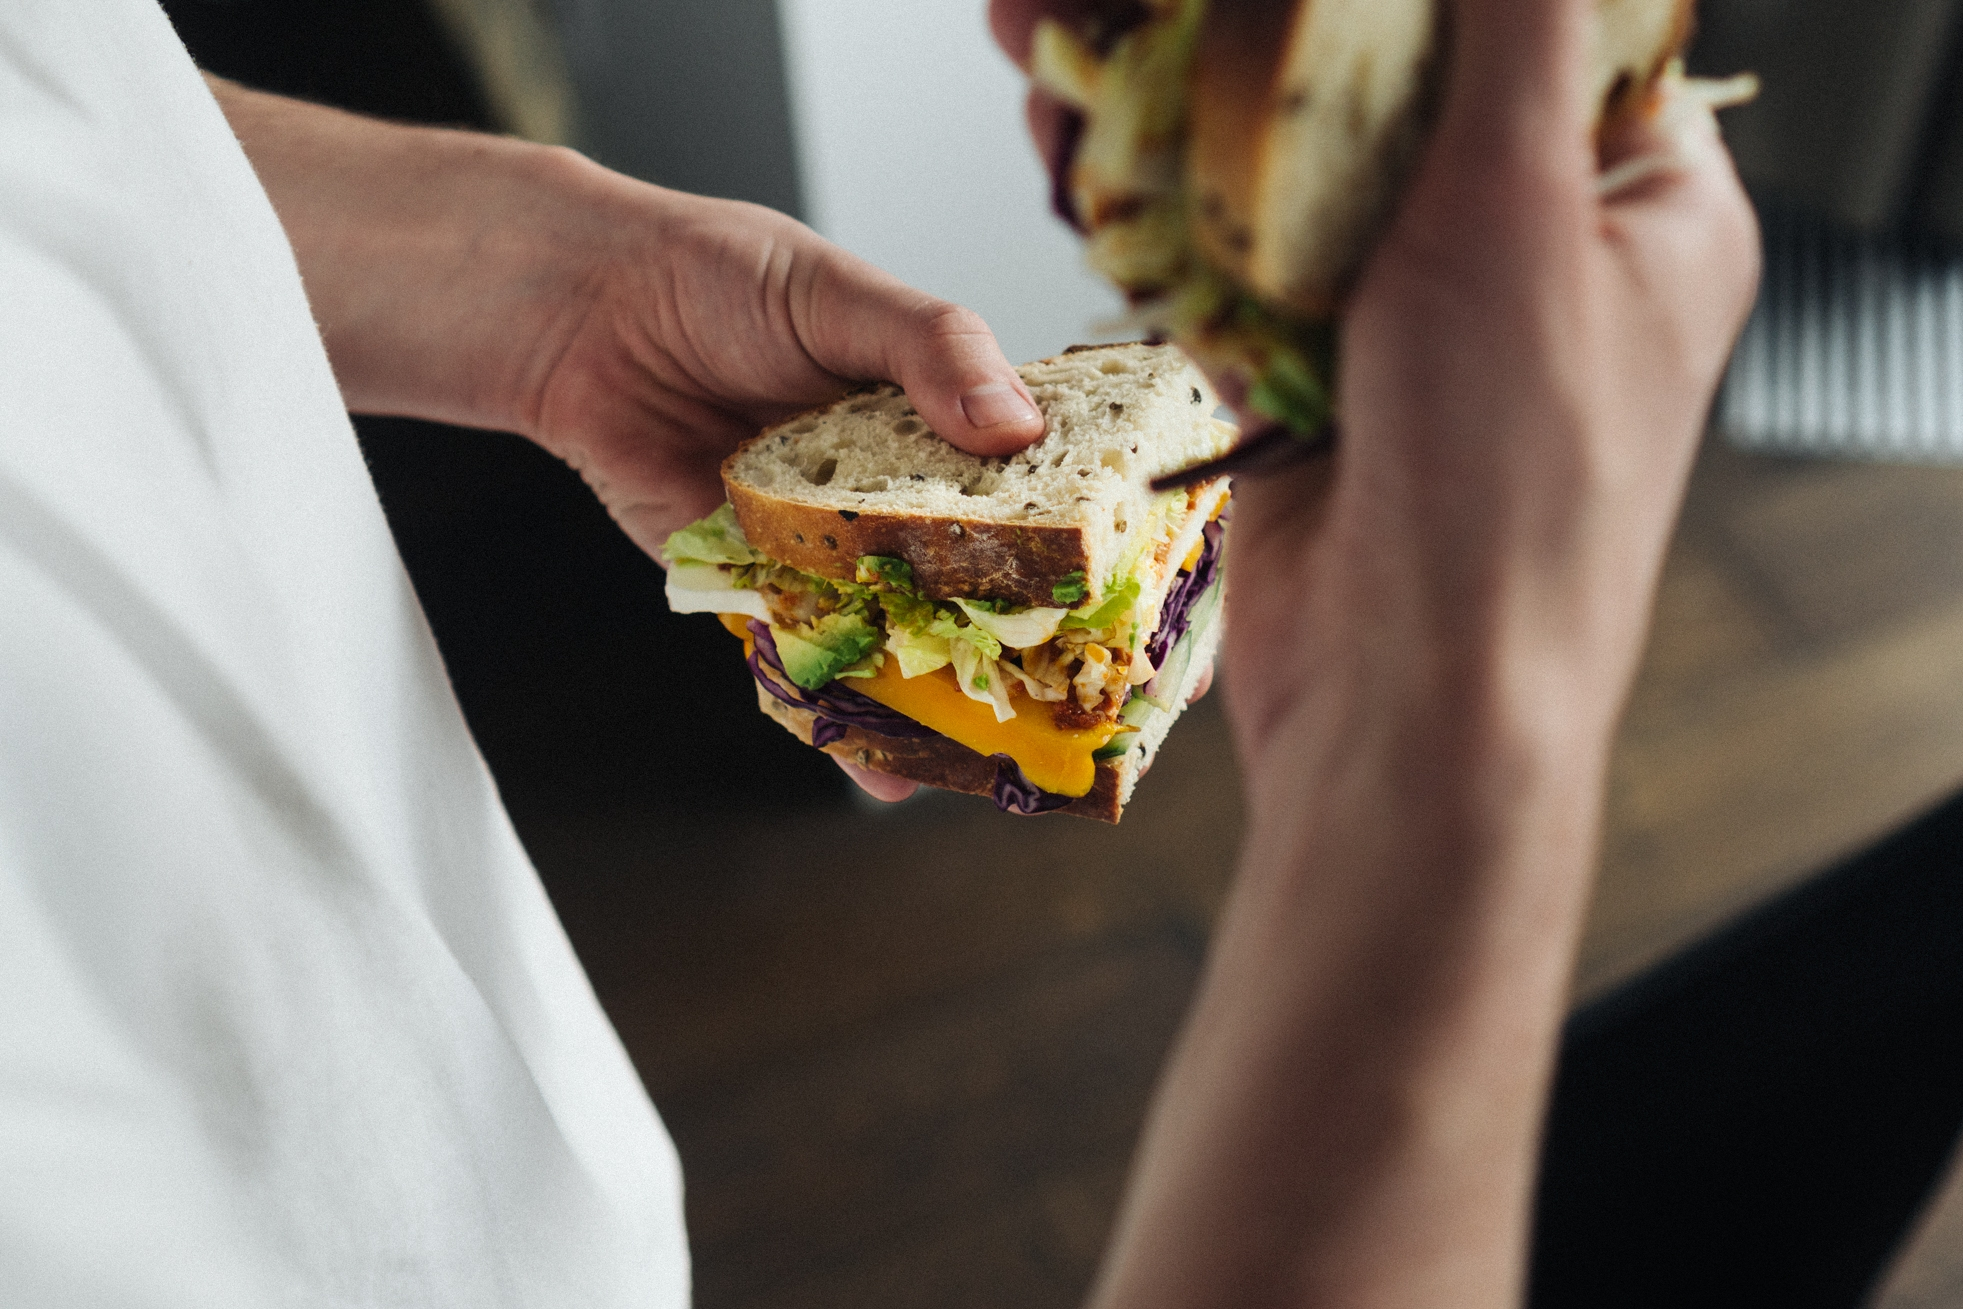 sourdough_mozzarella_and_rainbow_veggie_sandwich-7.jpg